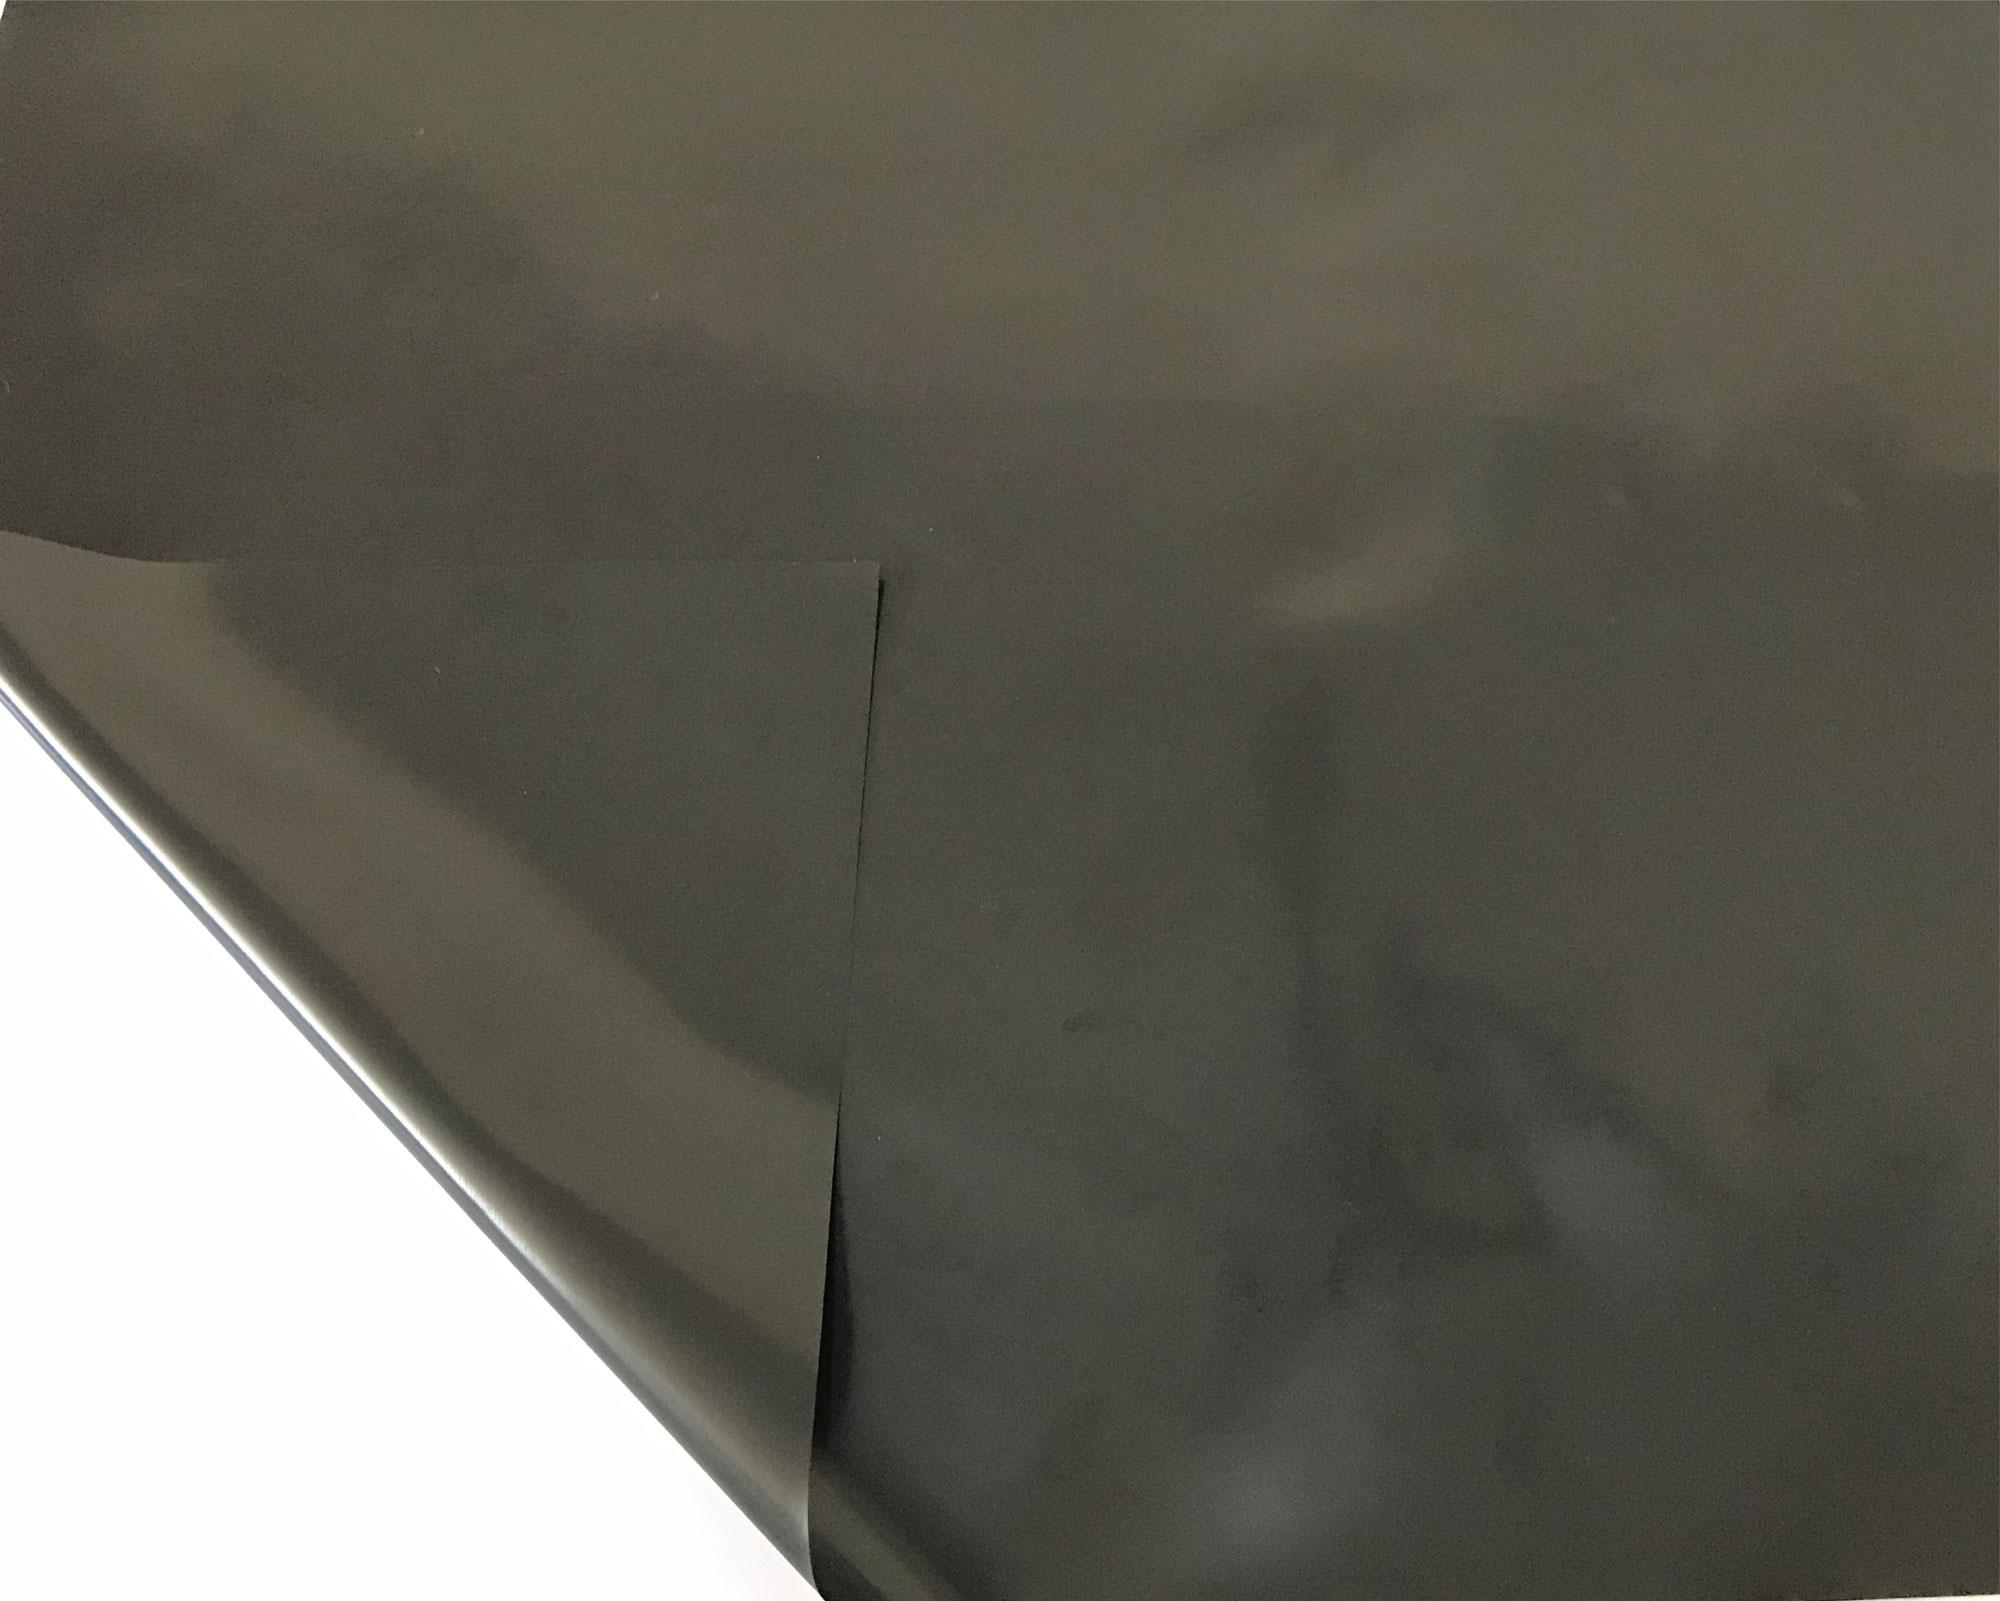 Lona Geomembrana + Manta Bidim 300 Micras - 7x2,5